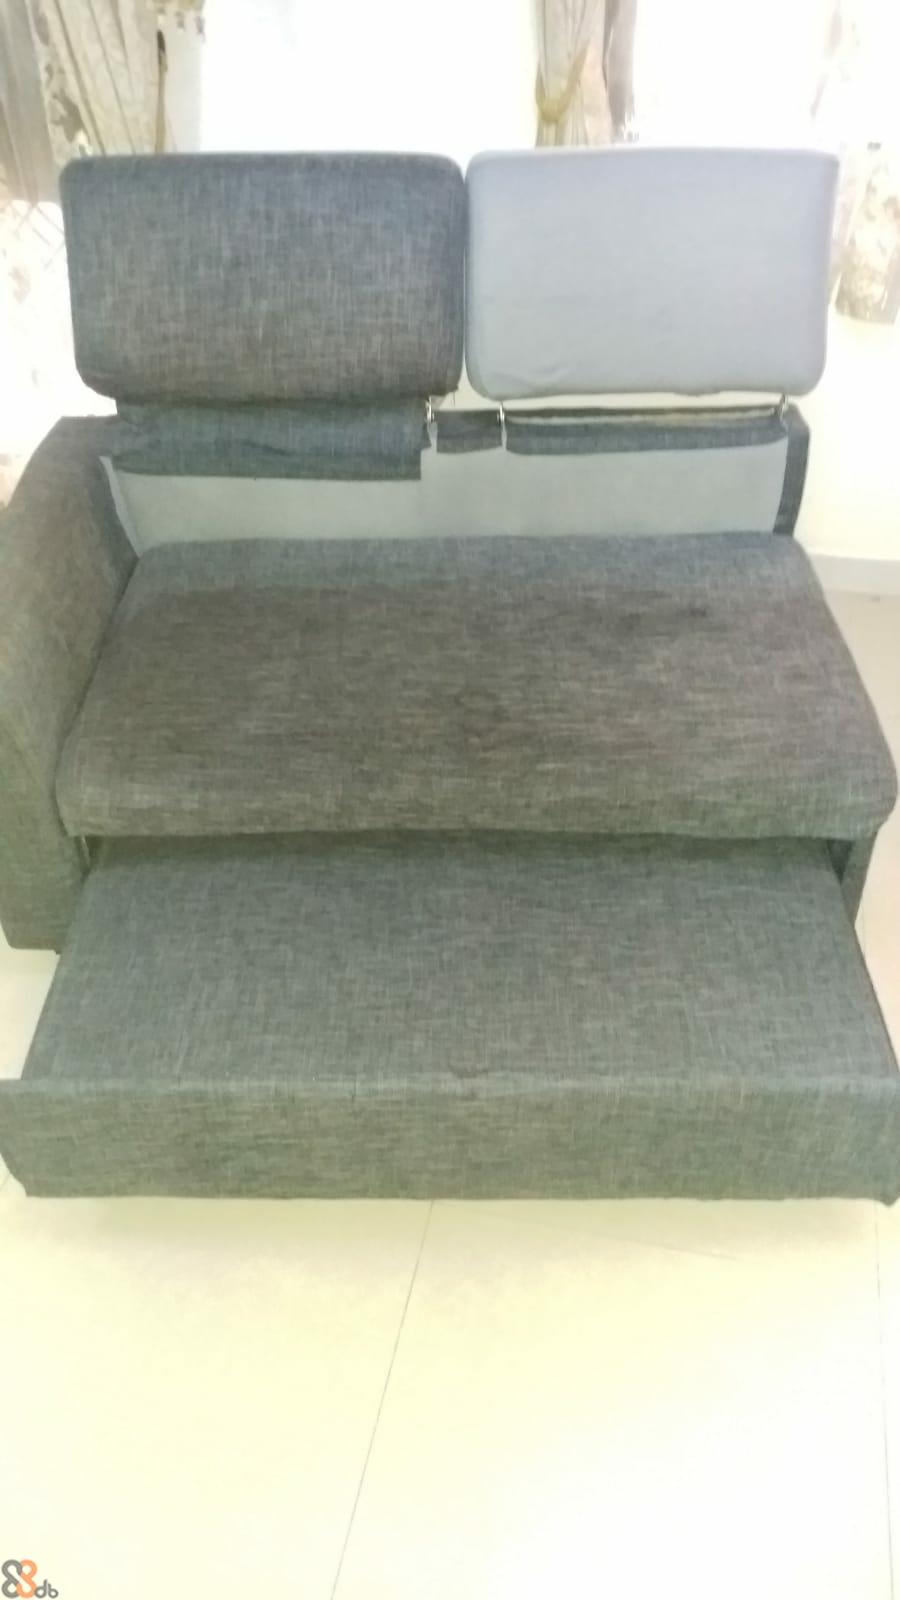 furniture,couch,floor,sofa bed,flooring